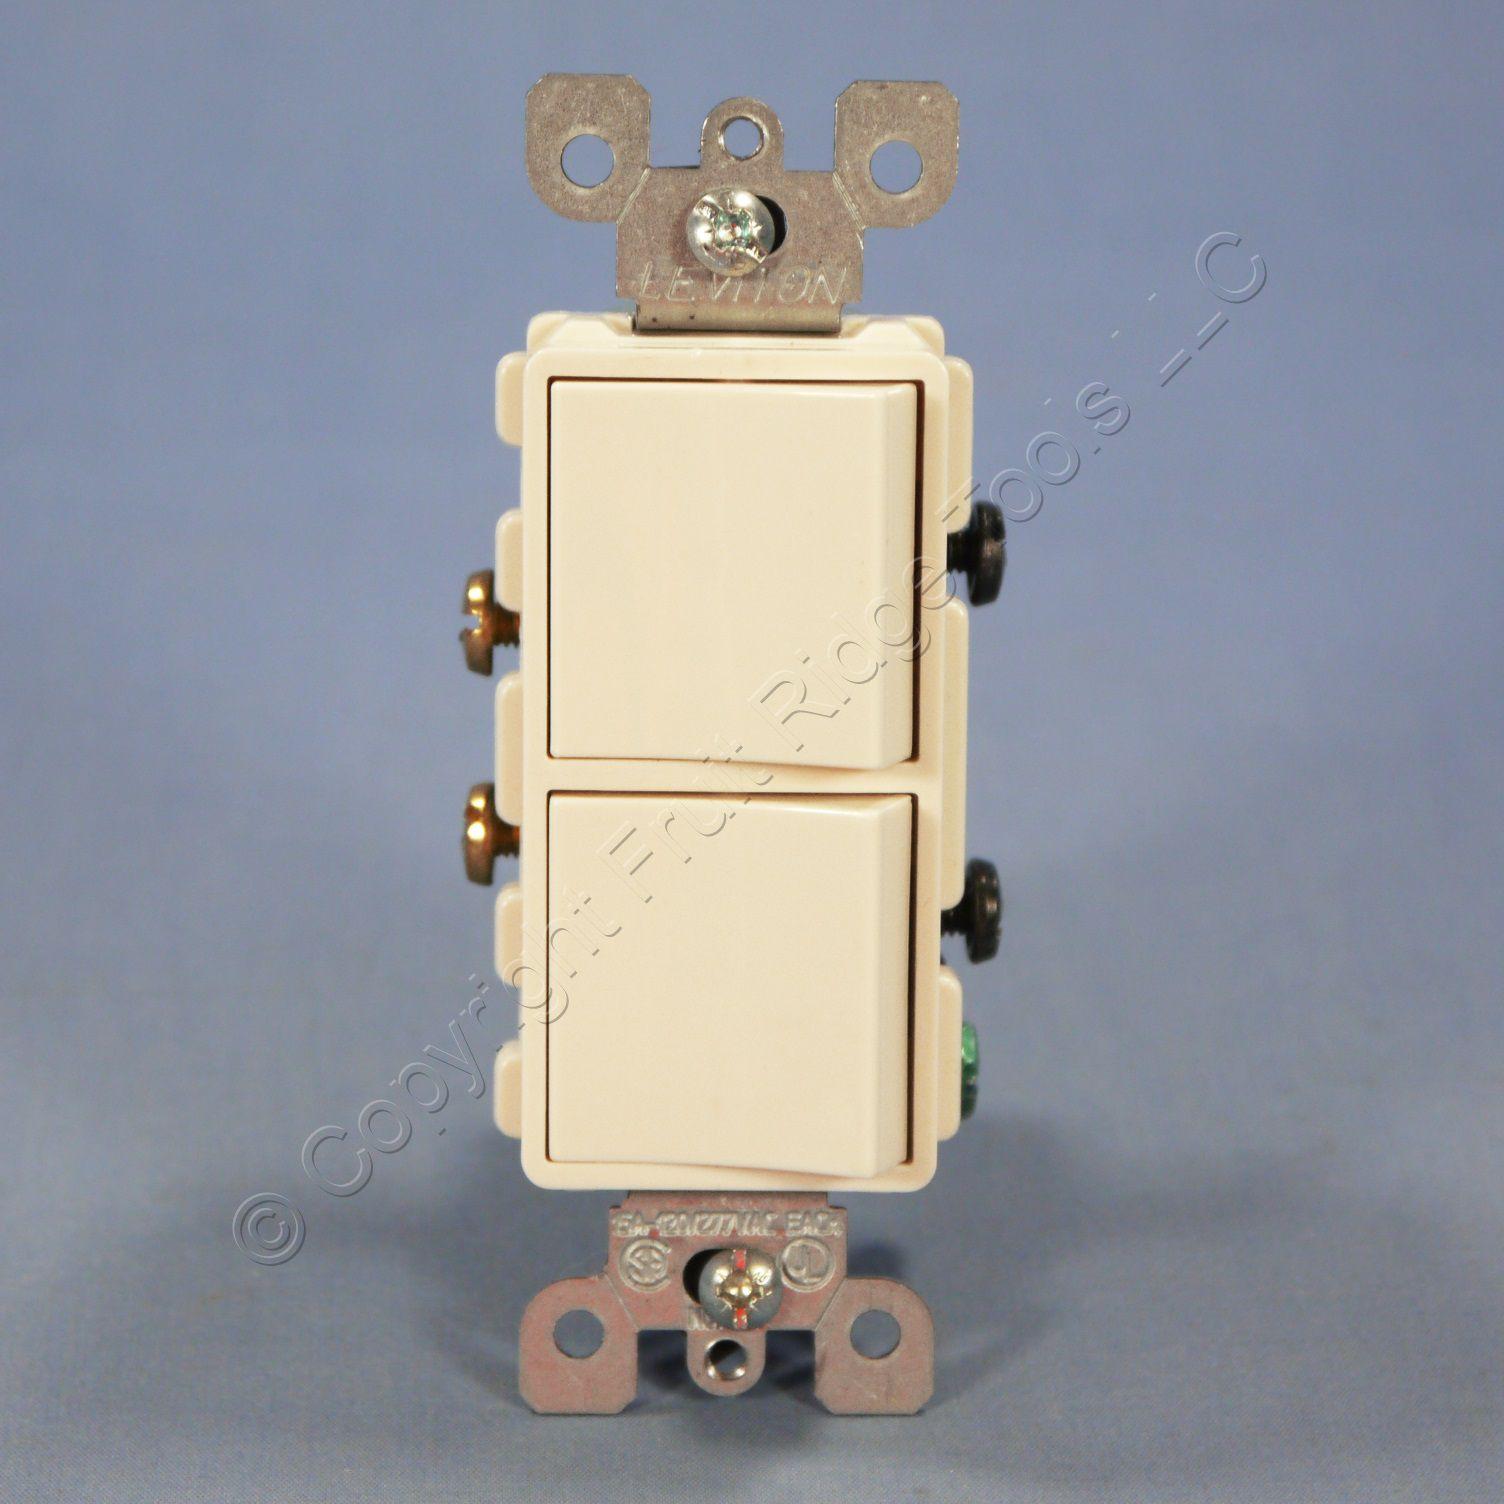 Leviton Almond Double Wall Light Switch Duplex Toggle 15A Single Pole 5224-2A